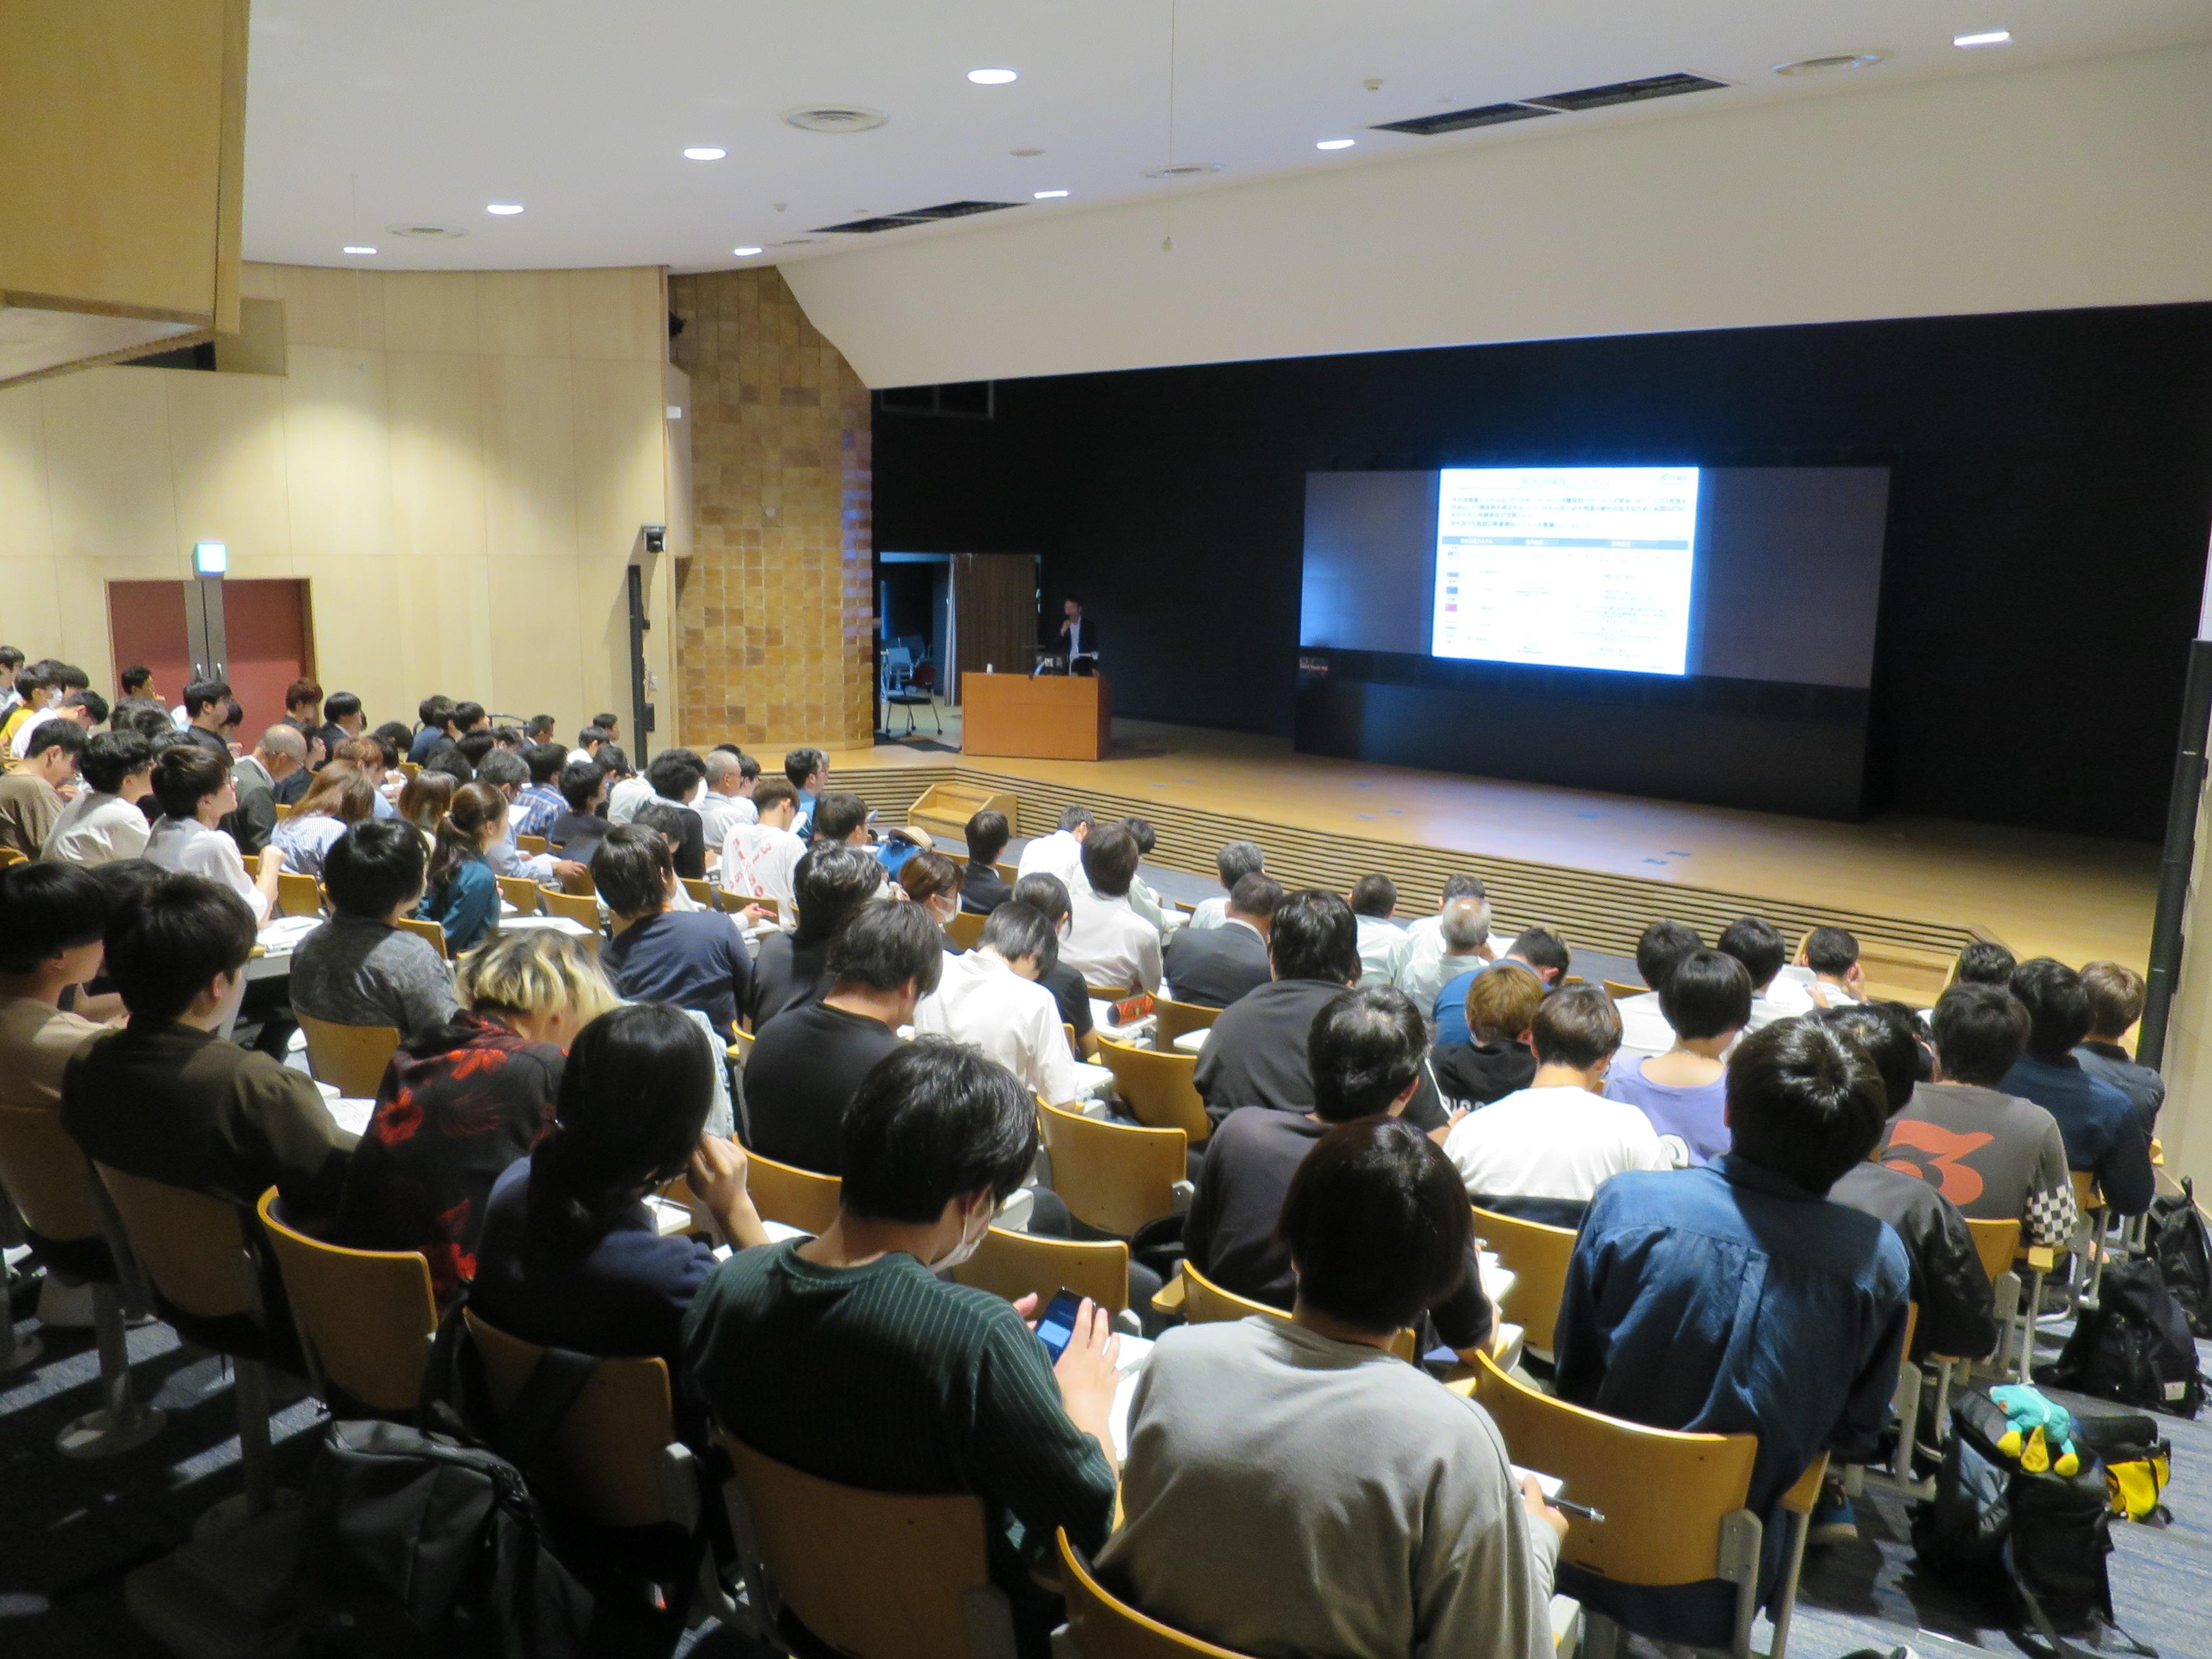 MEGA地震予測で知られる村井俊治東京大学名誉教授による特別講演「地象リモートセンシングによる地震予測」など講演4件を実施。「令和元年度 第2回空間情報セミナー」を開催。 -- 金沢工業大学